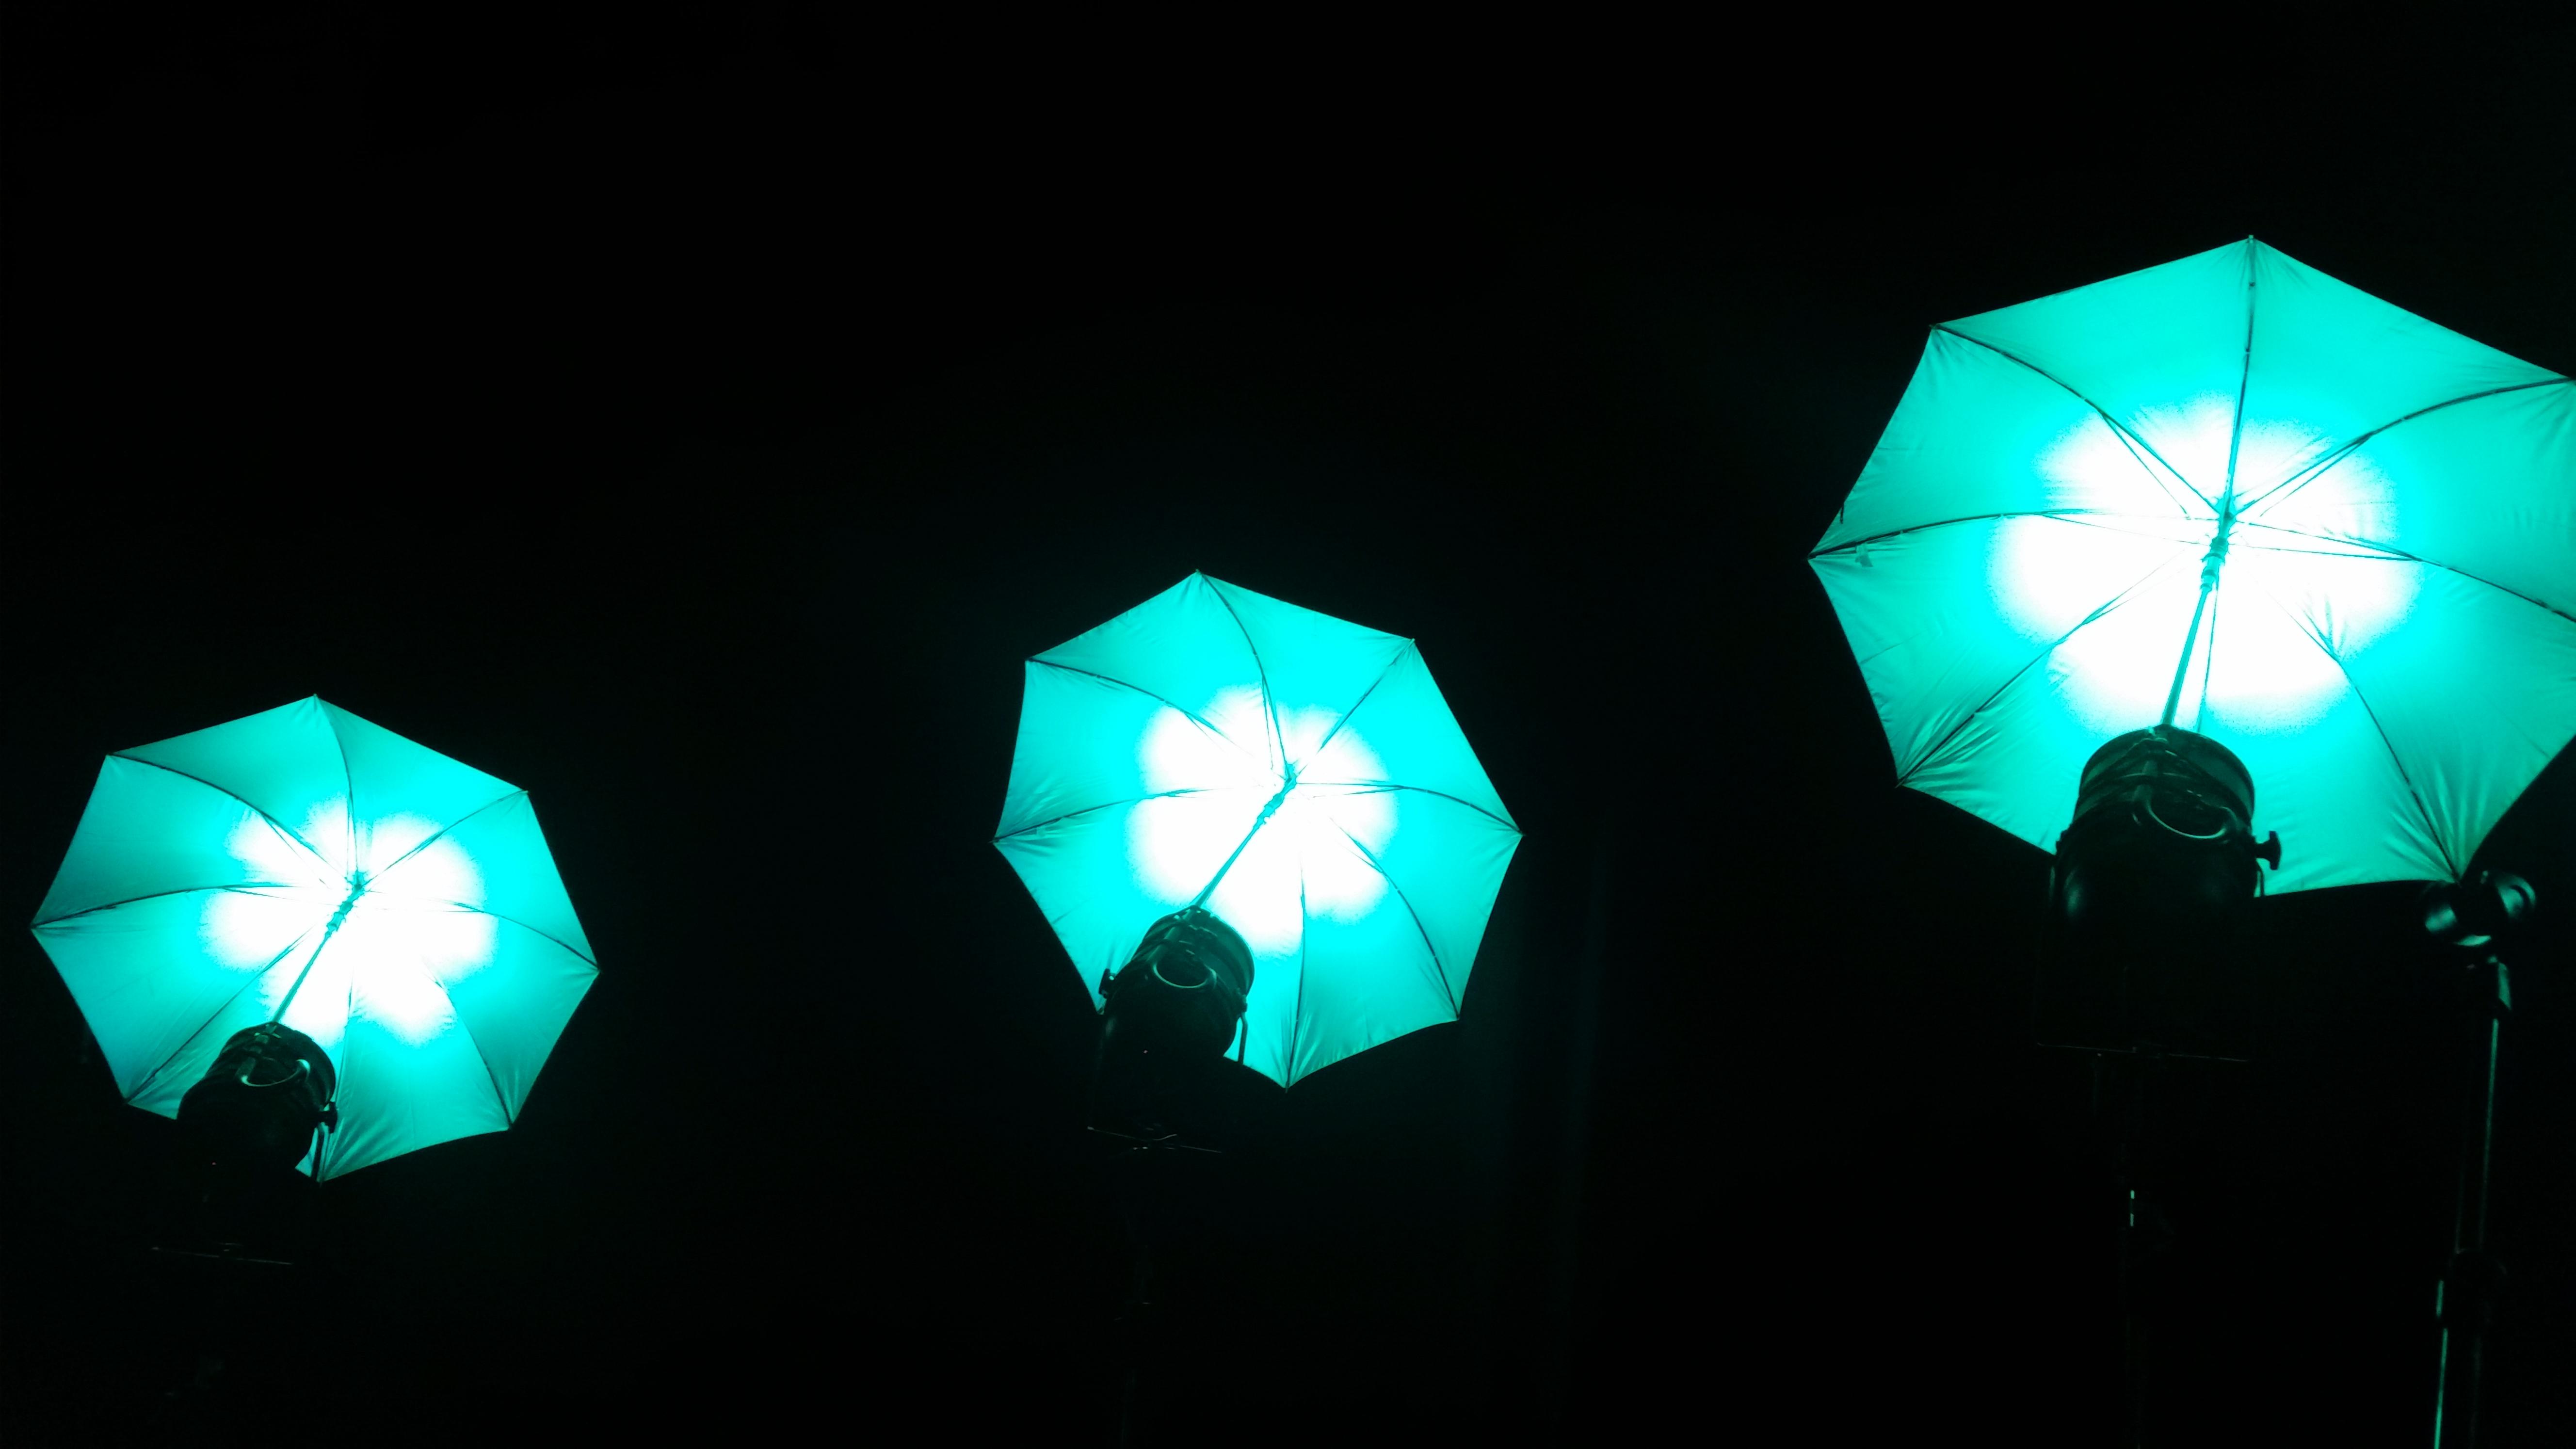 Neue LED Schirme als Designelemente 6